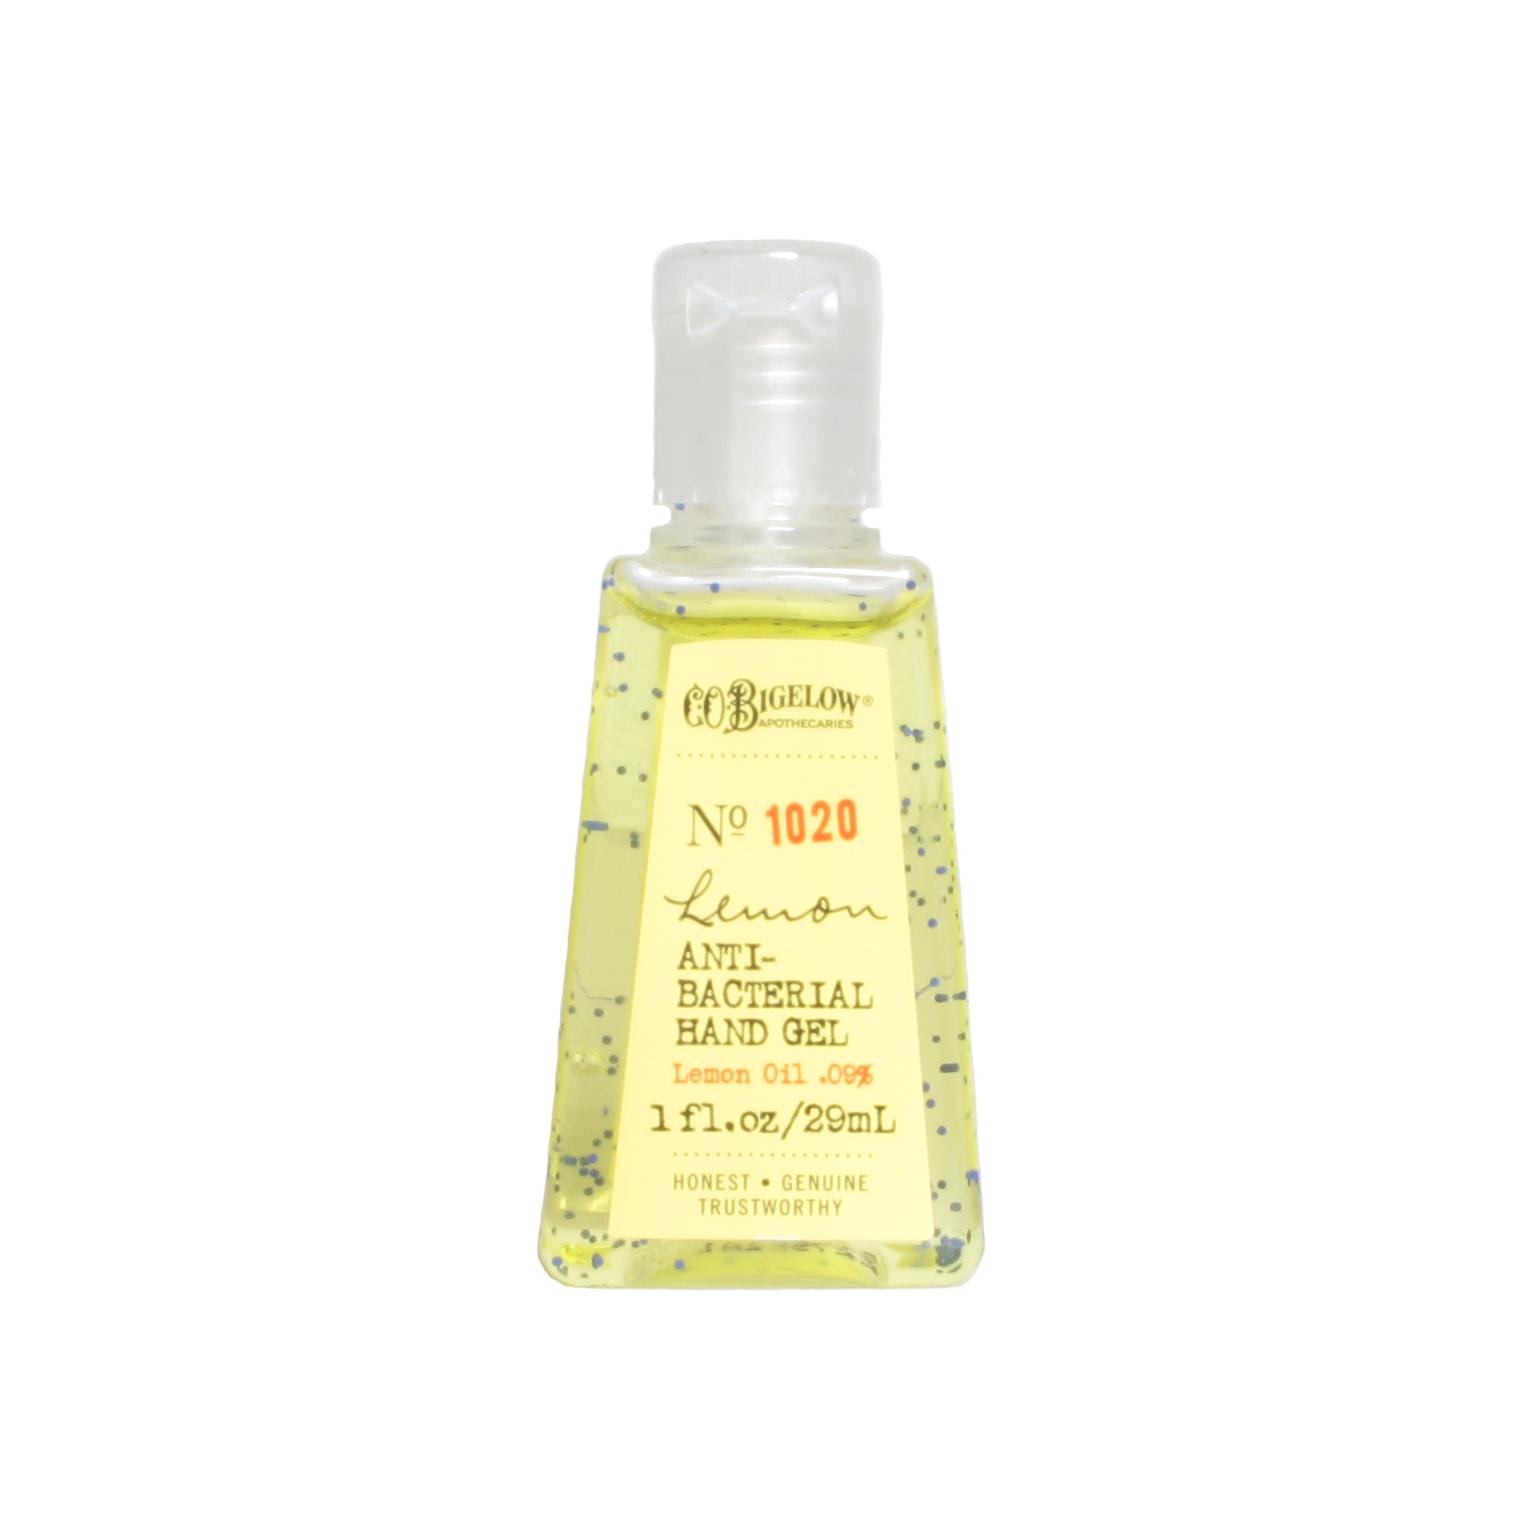 CO-Bigelow-Anti_Bacterial-Hand-Gel-Lemon